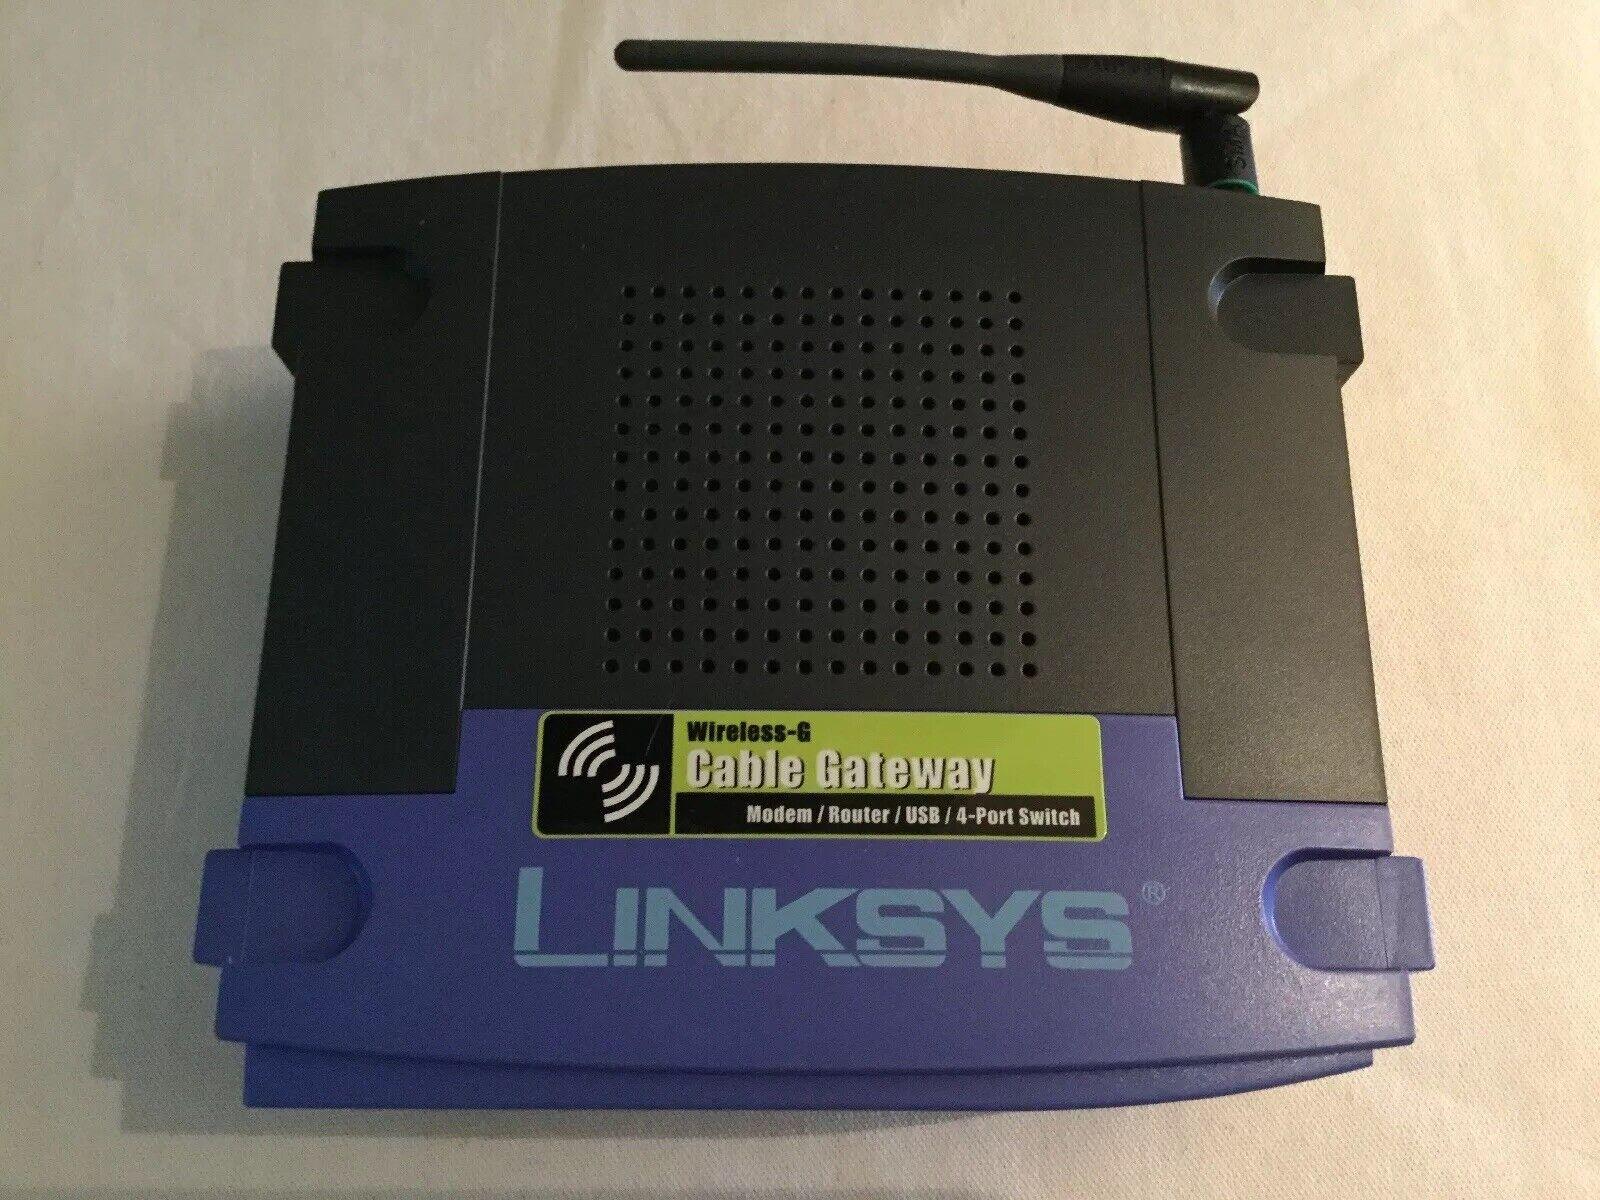 LINKSYS WIRELESS-G CABLE GATEWAY WCG200 DRIVER WINDOWS XP